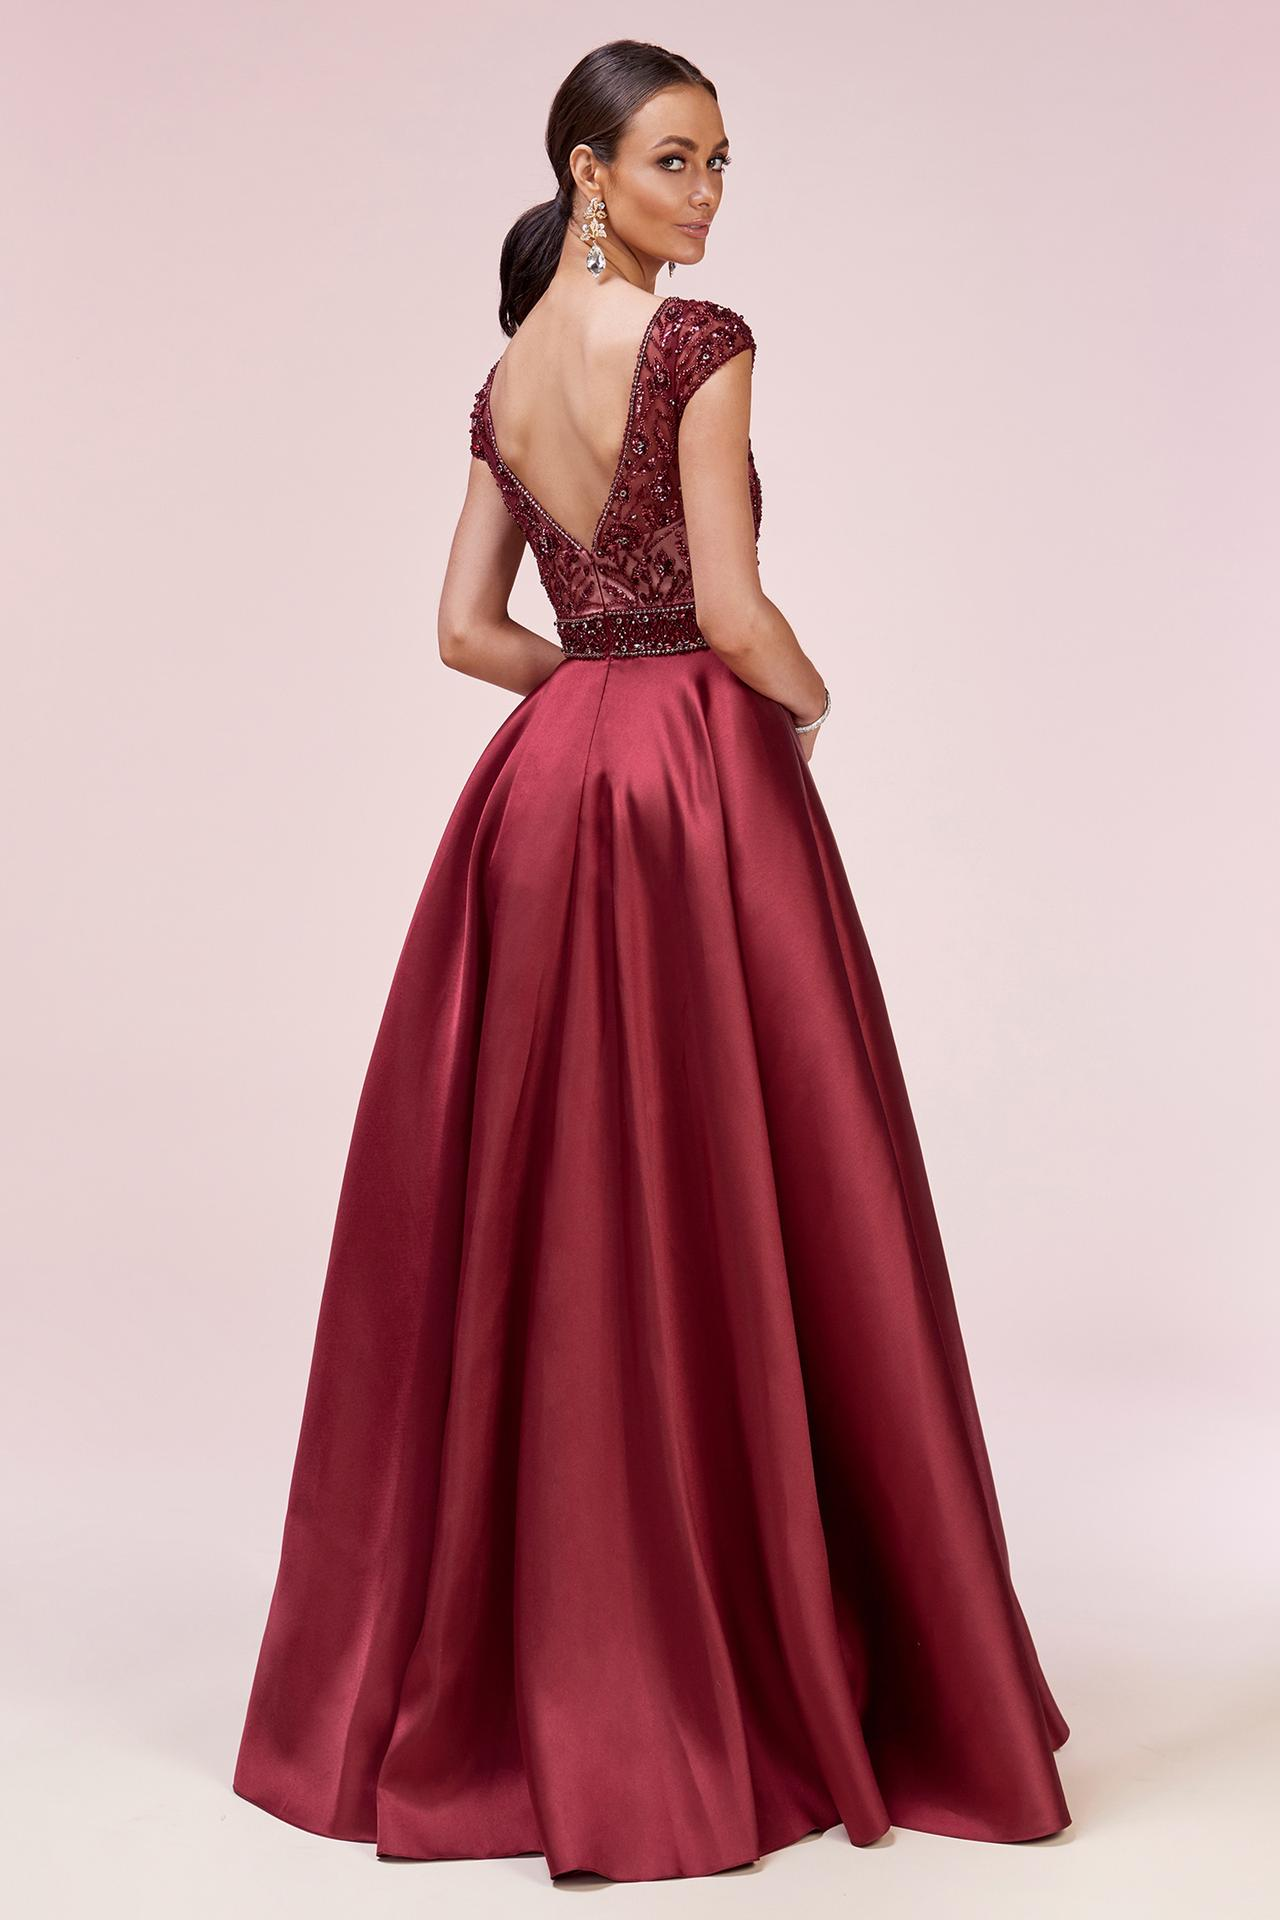 Nové spoločenské šaty :) - Obrázok č. 27